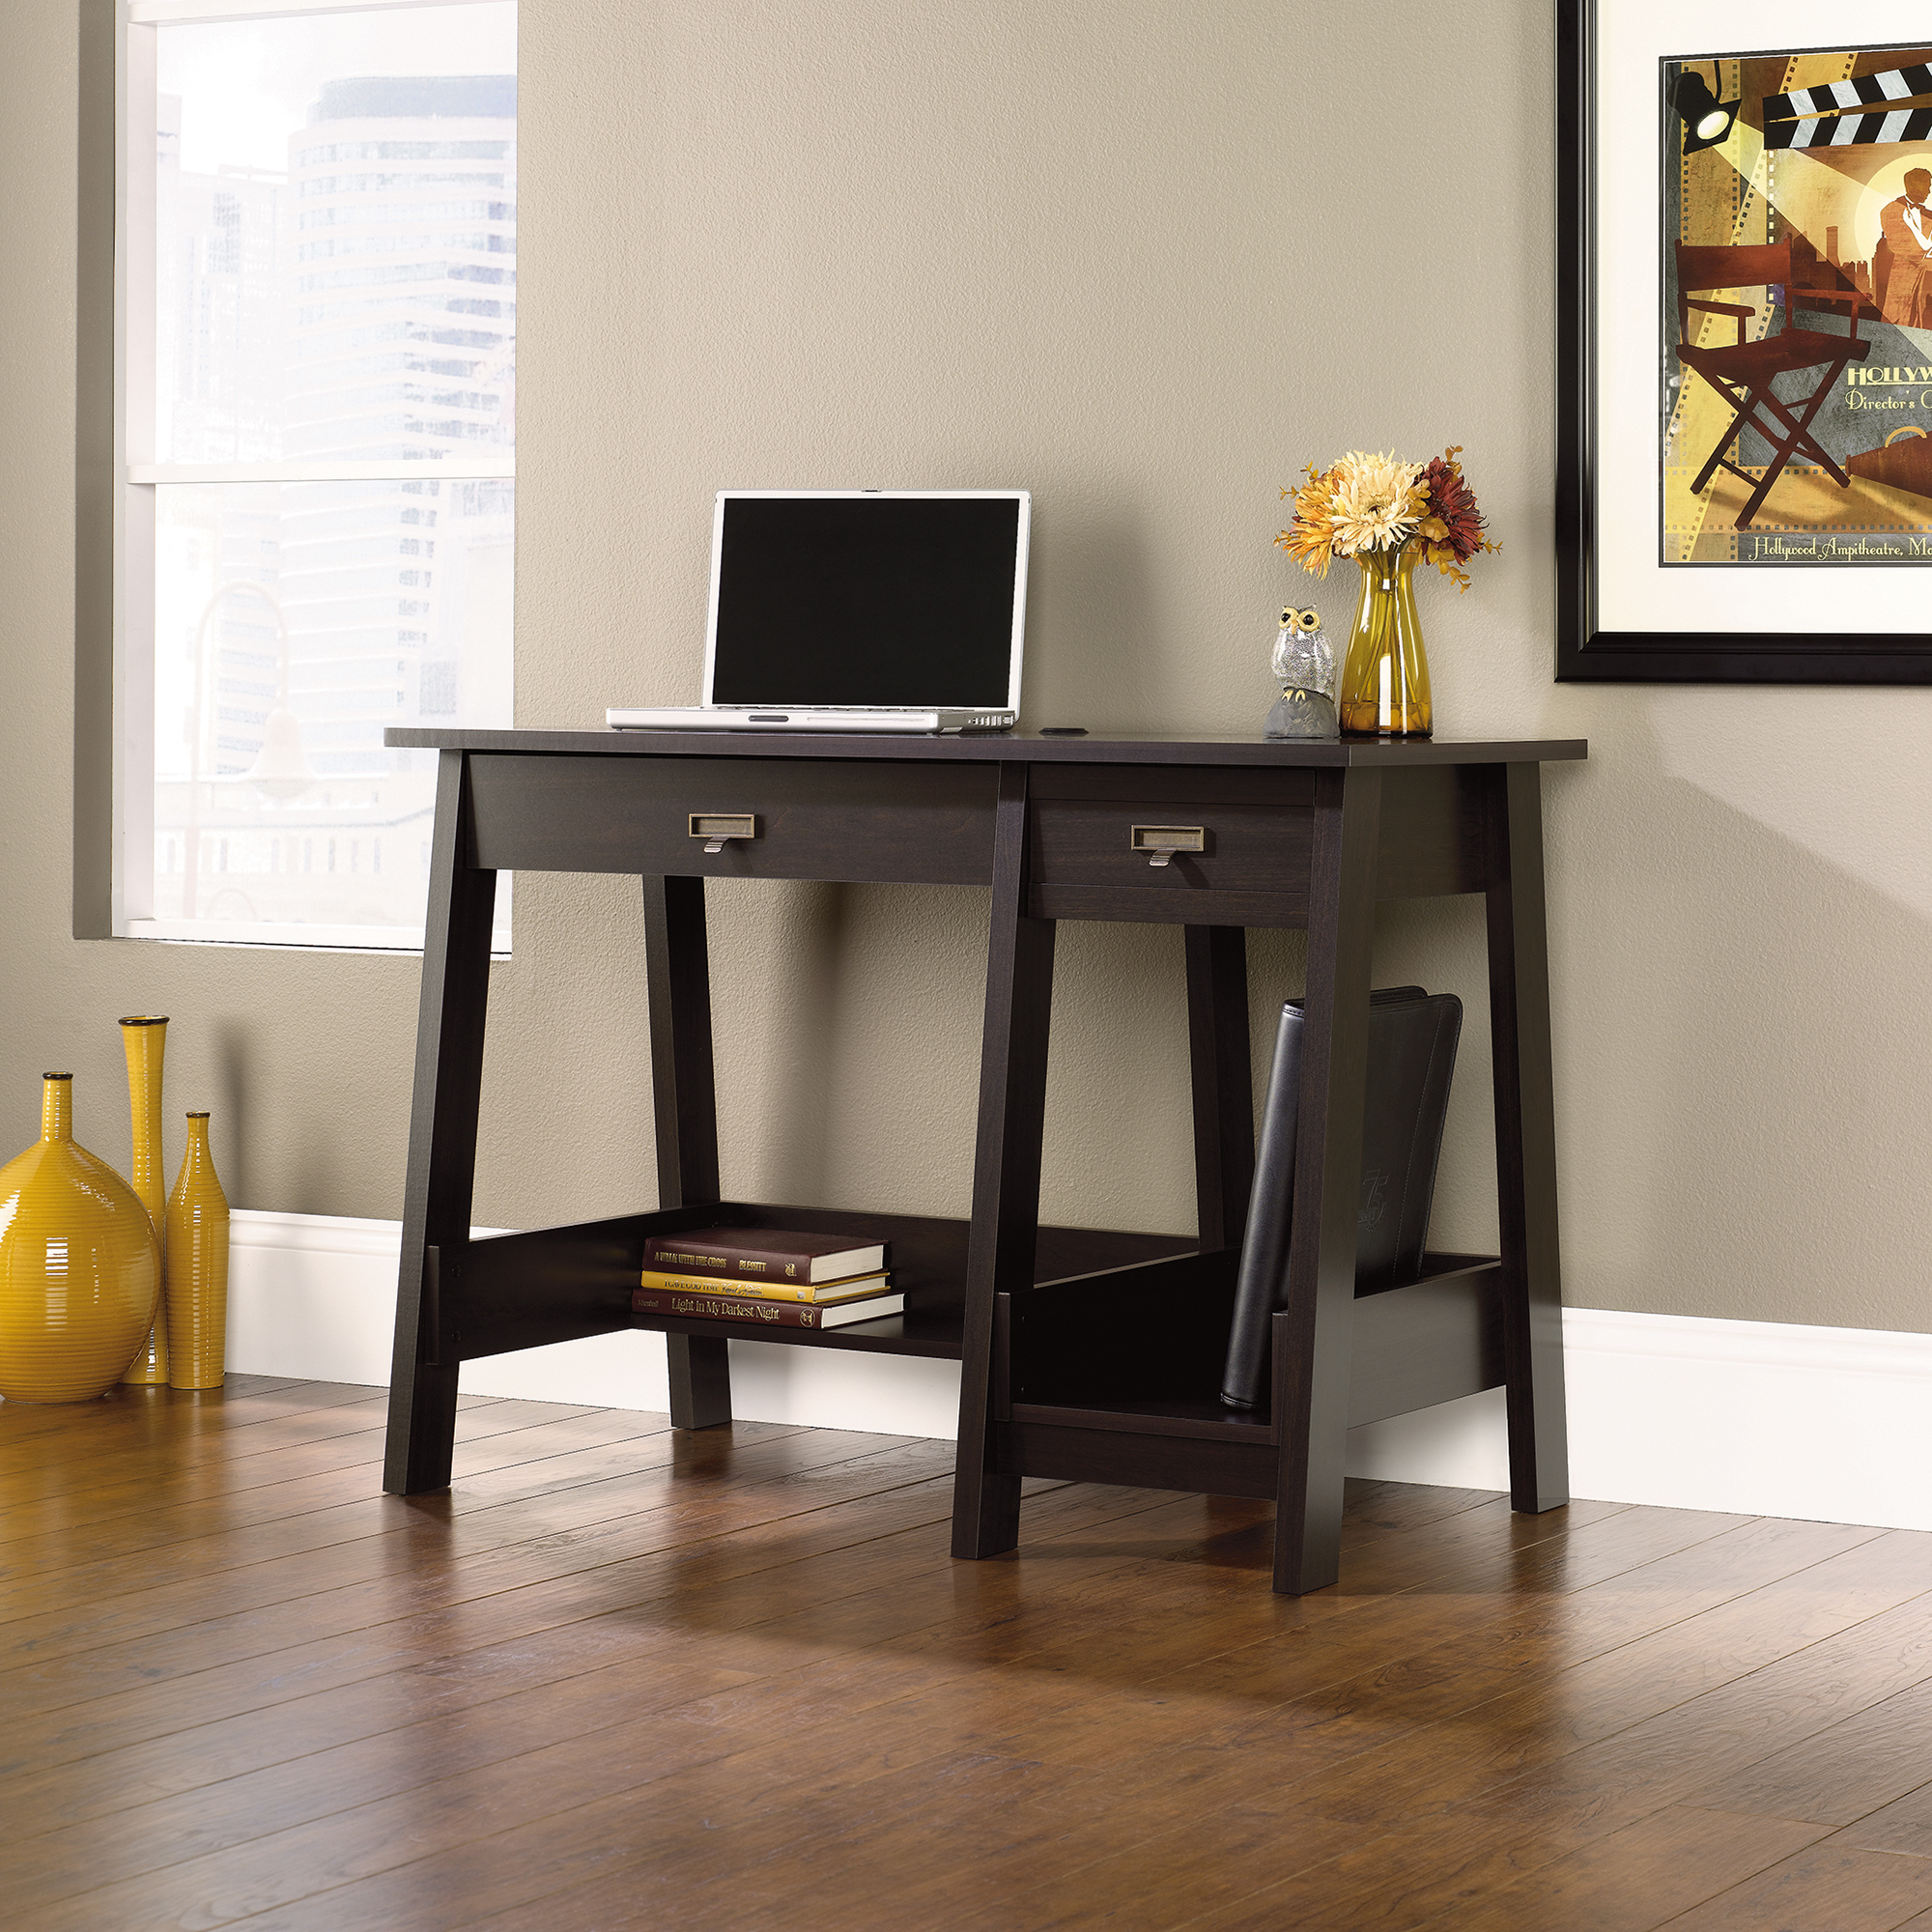 Sauder Trestle Desk (415956)